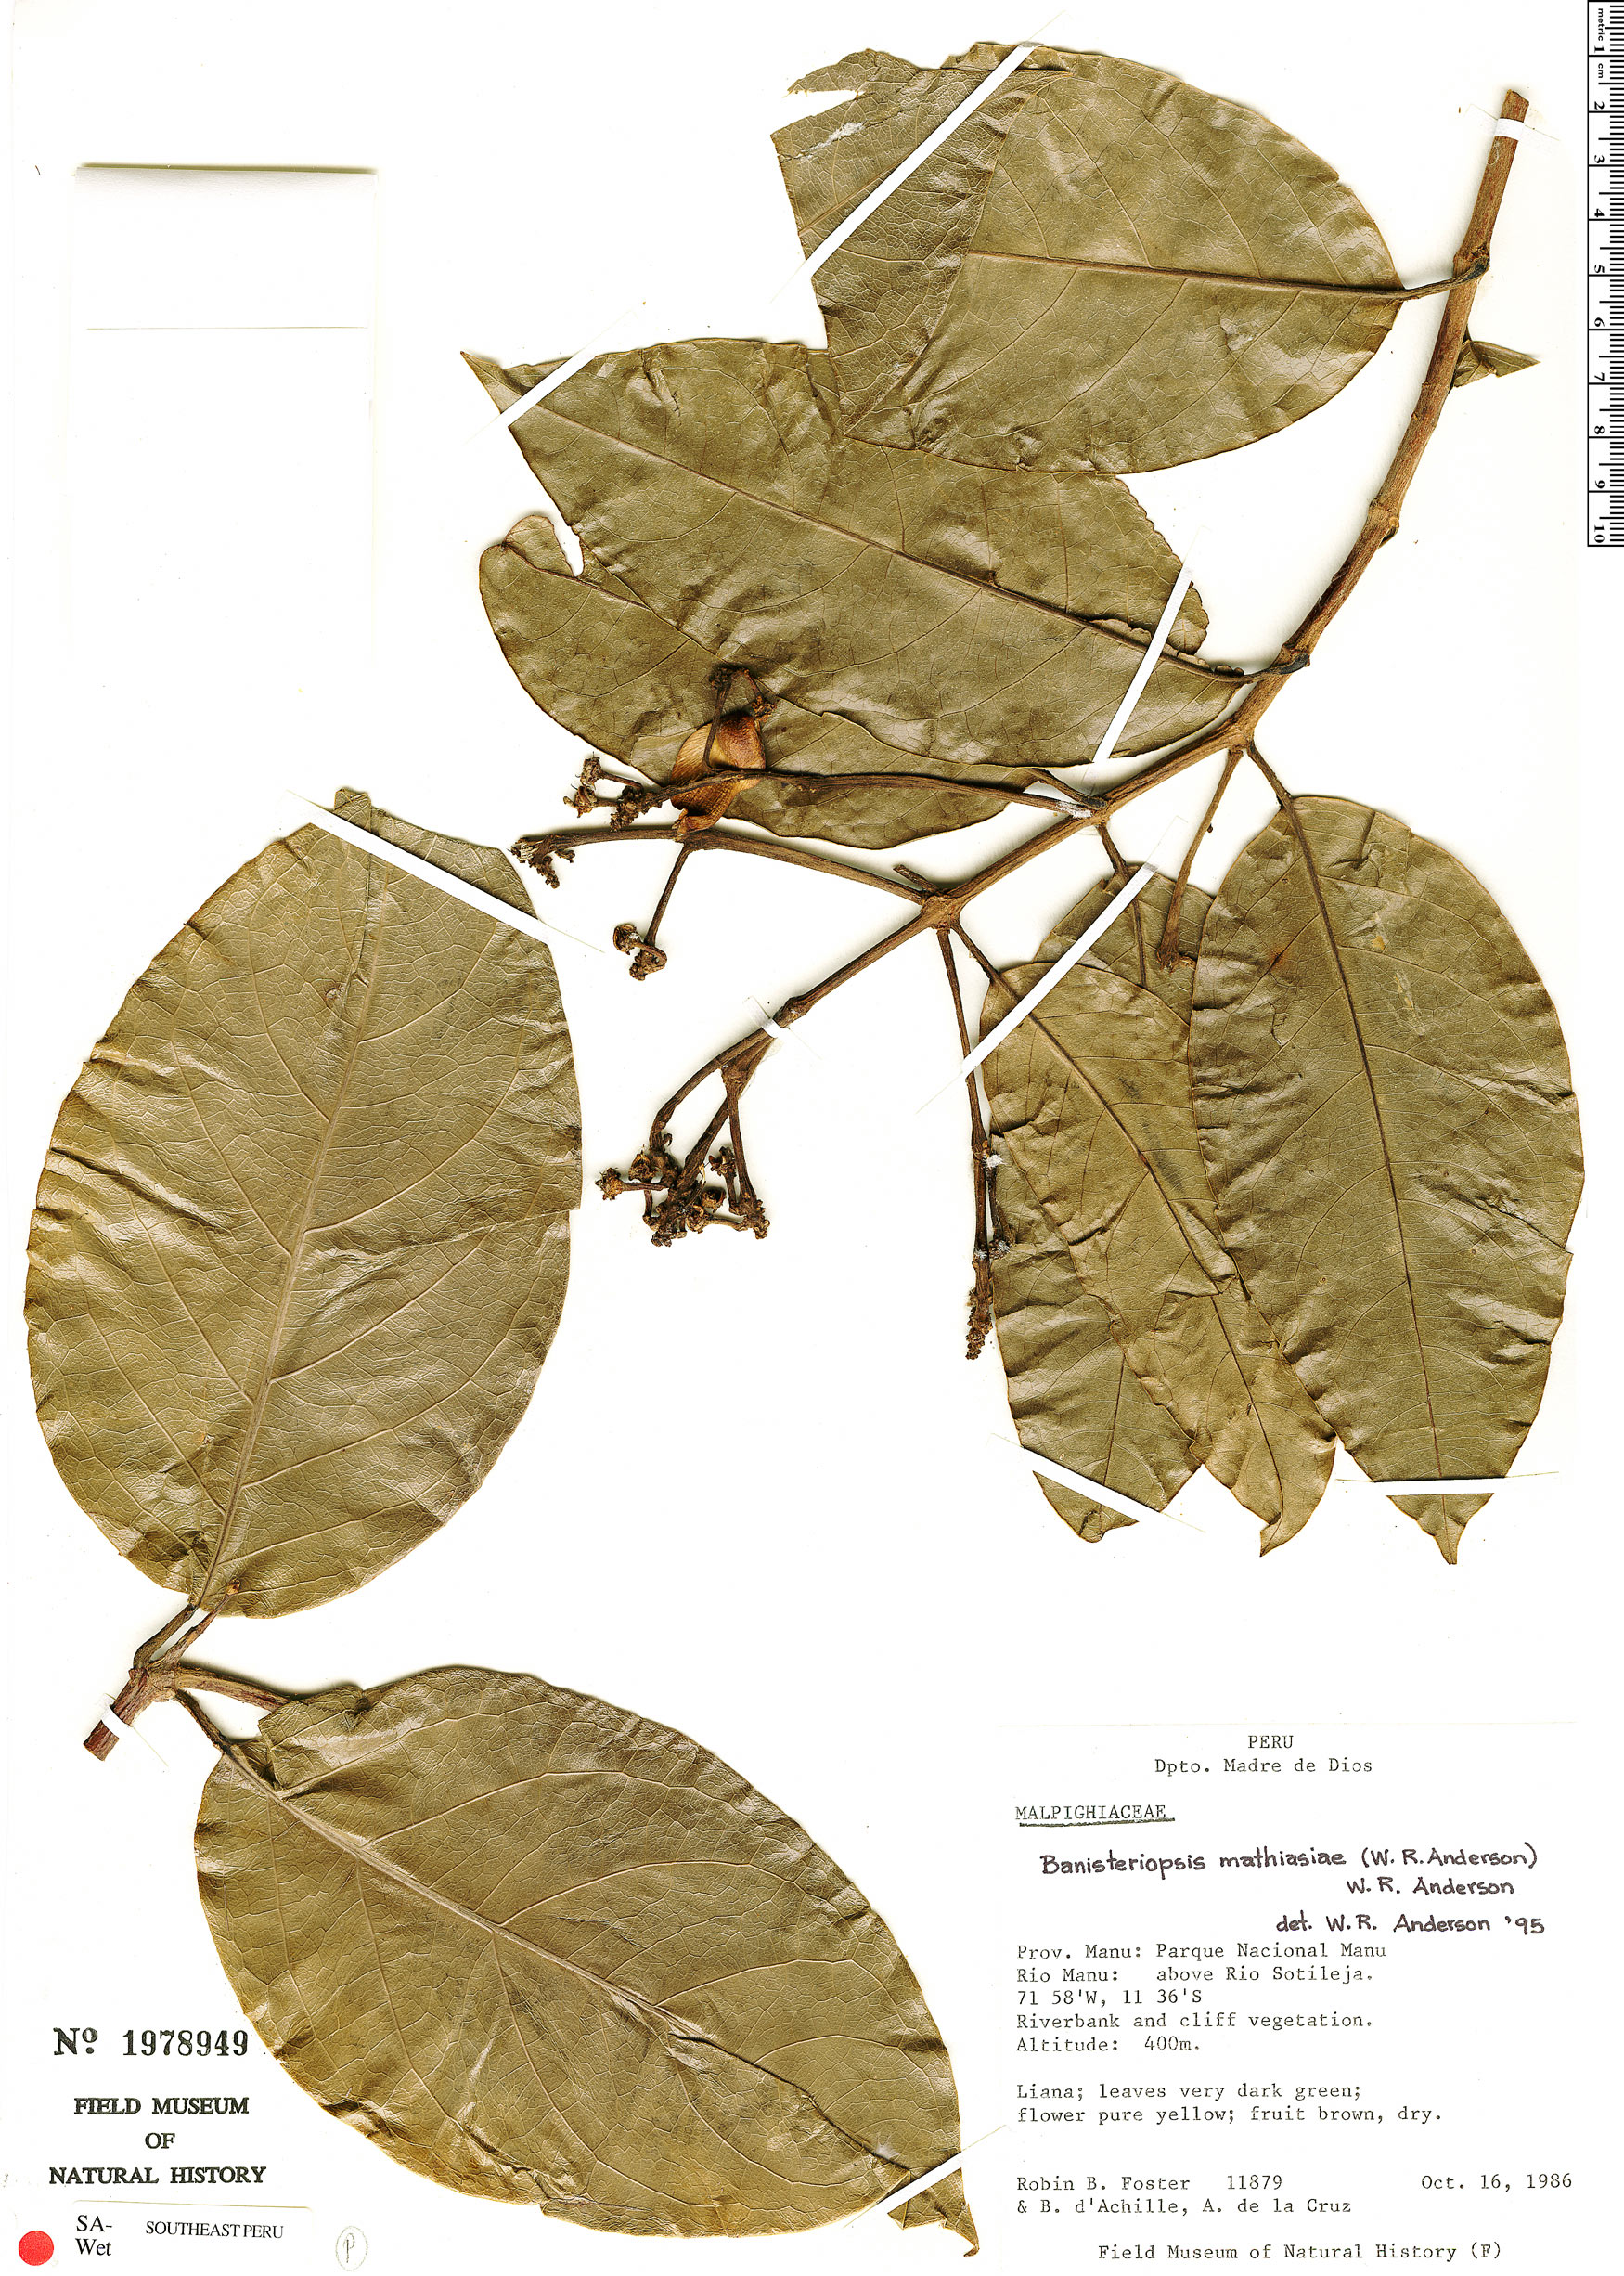 Specimen: Bronwenia mathiasiae